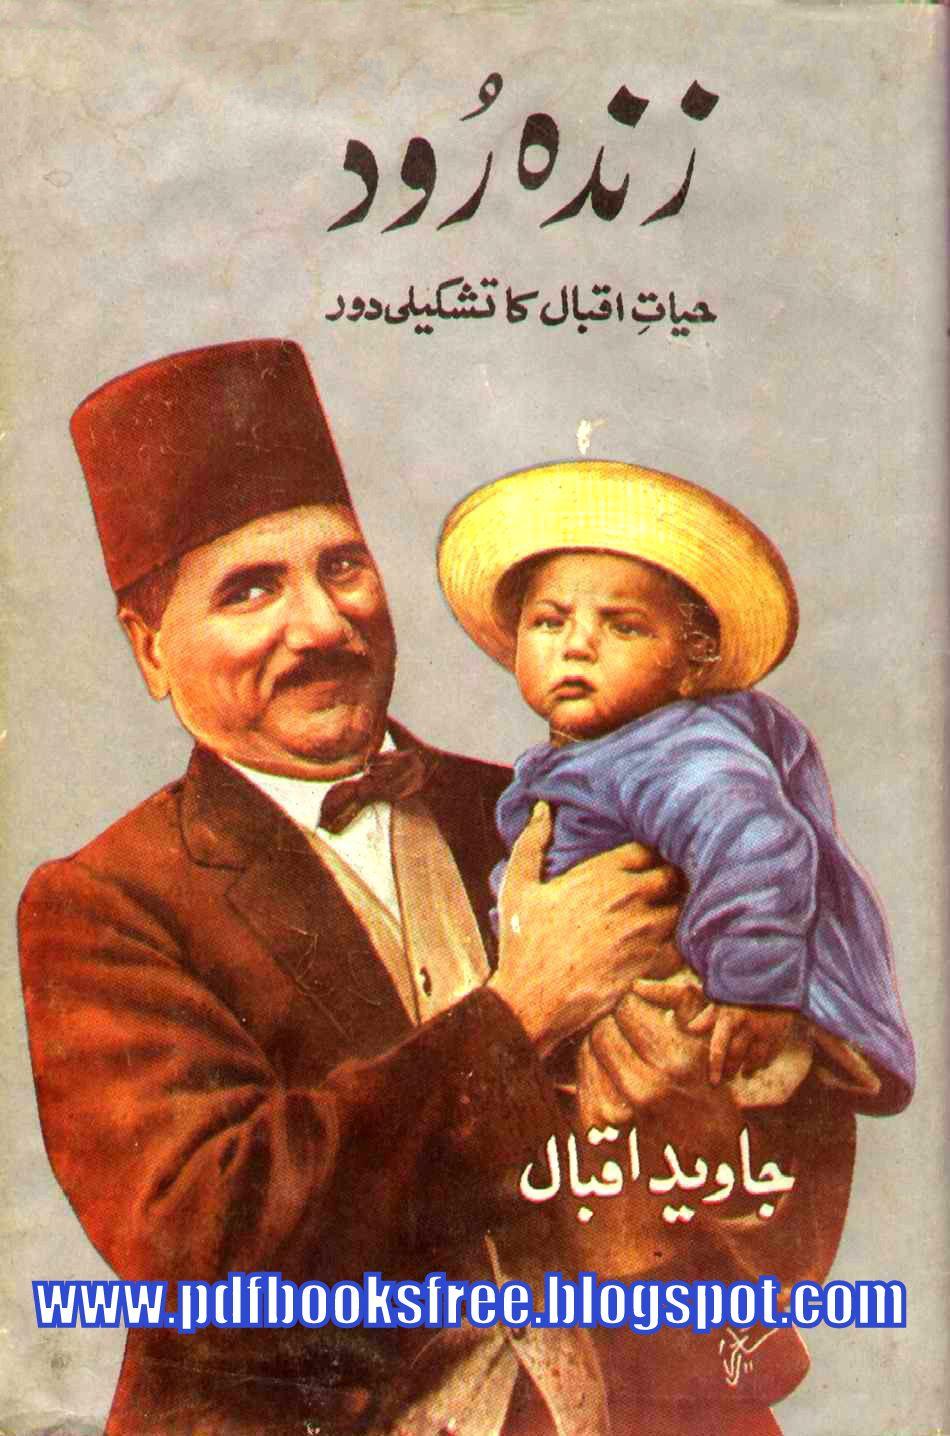 All Books of Muhammed Zafar Iqbal 1